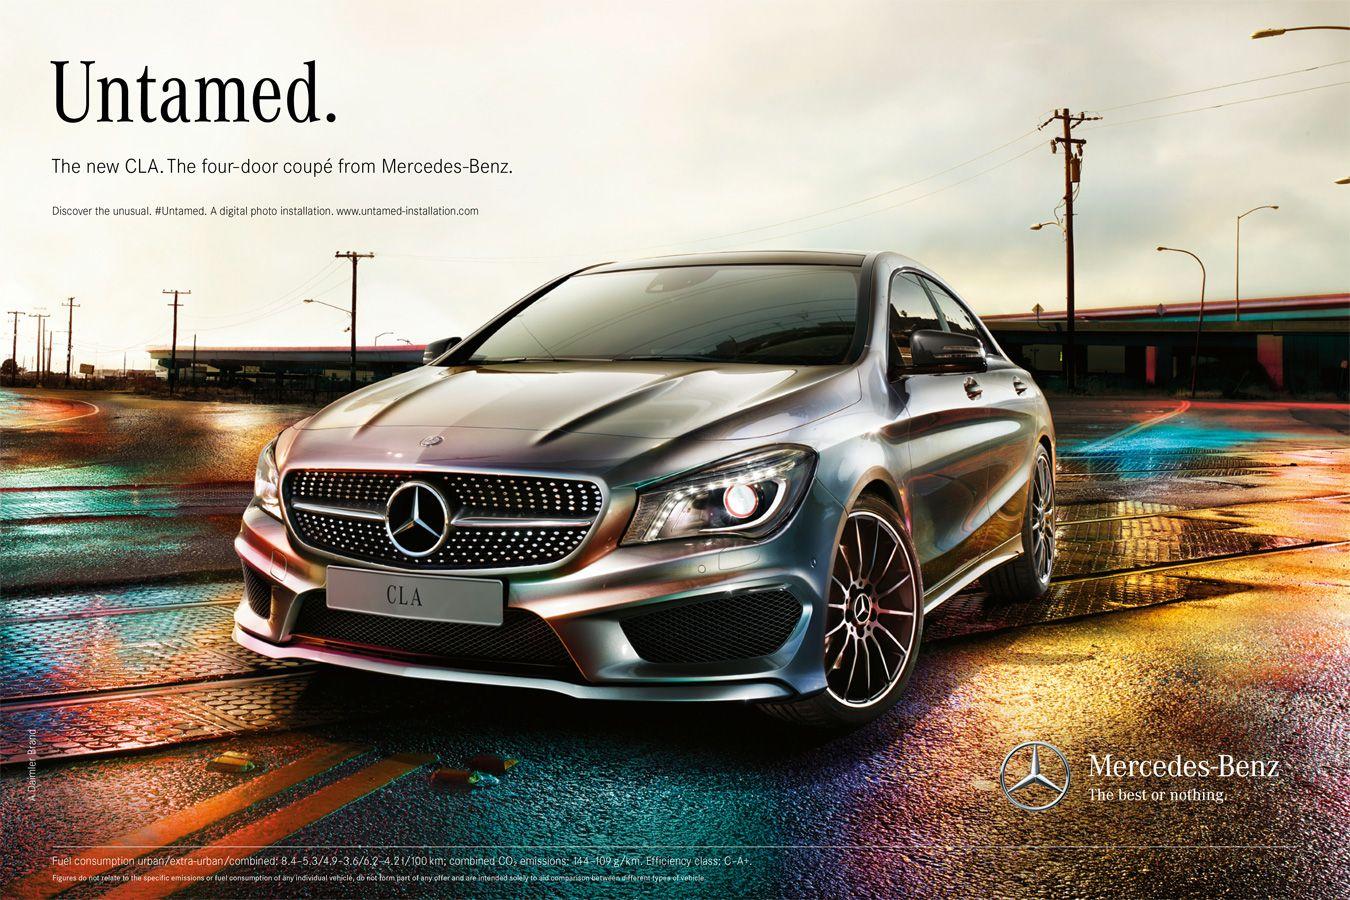 Mercedes cla transportation uwe duettmann ad car for Mercedes benz slogan